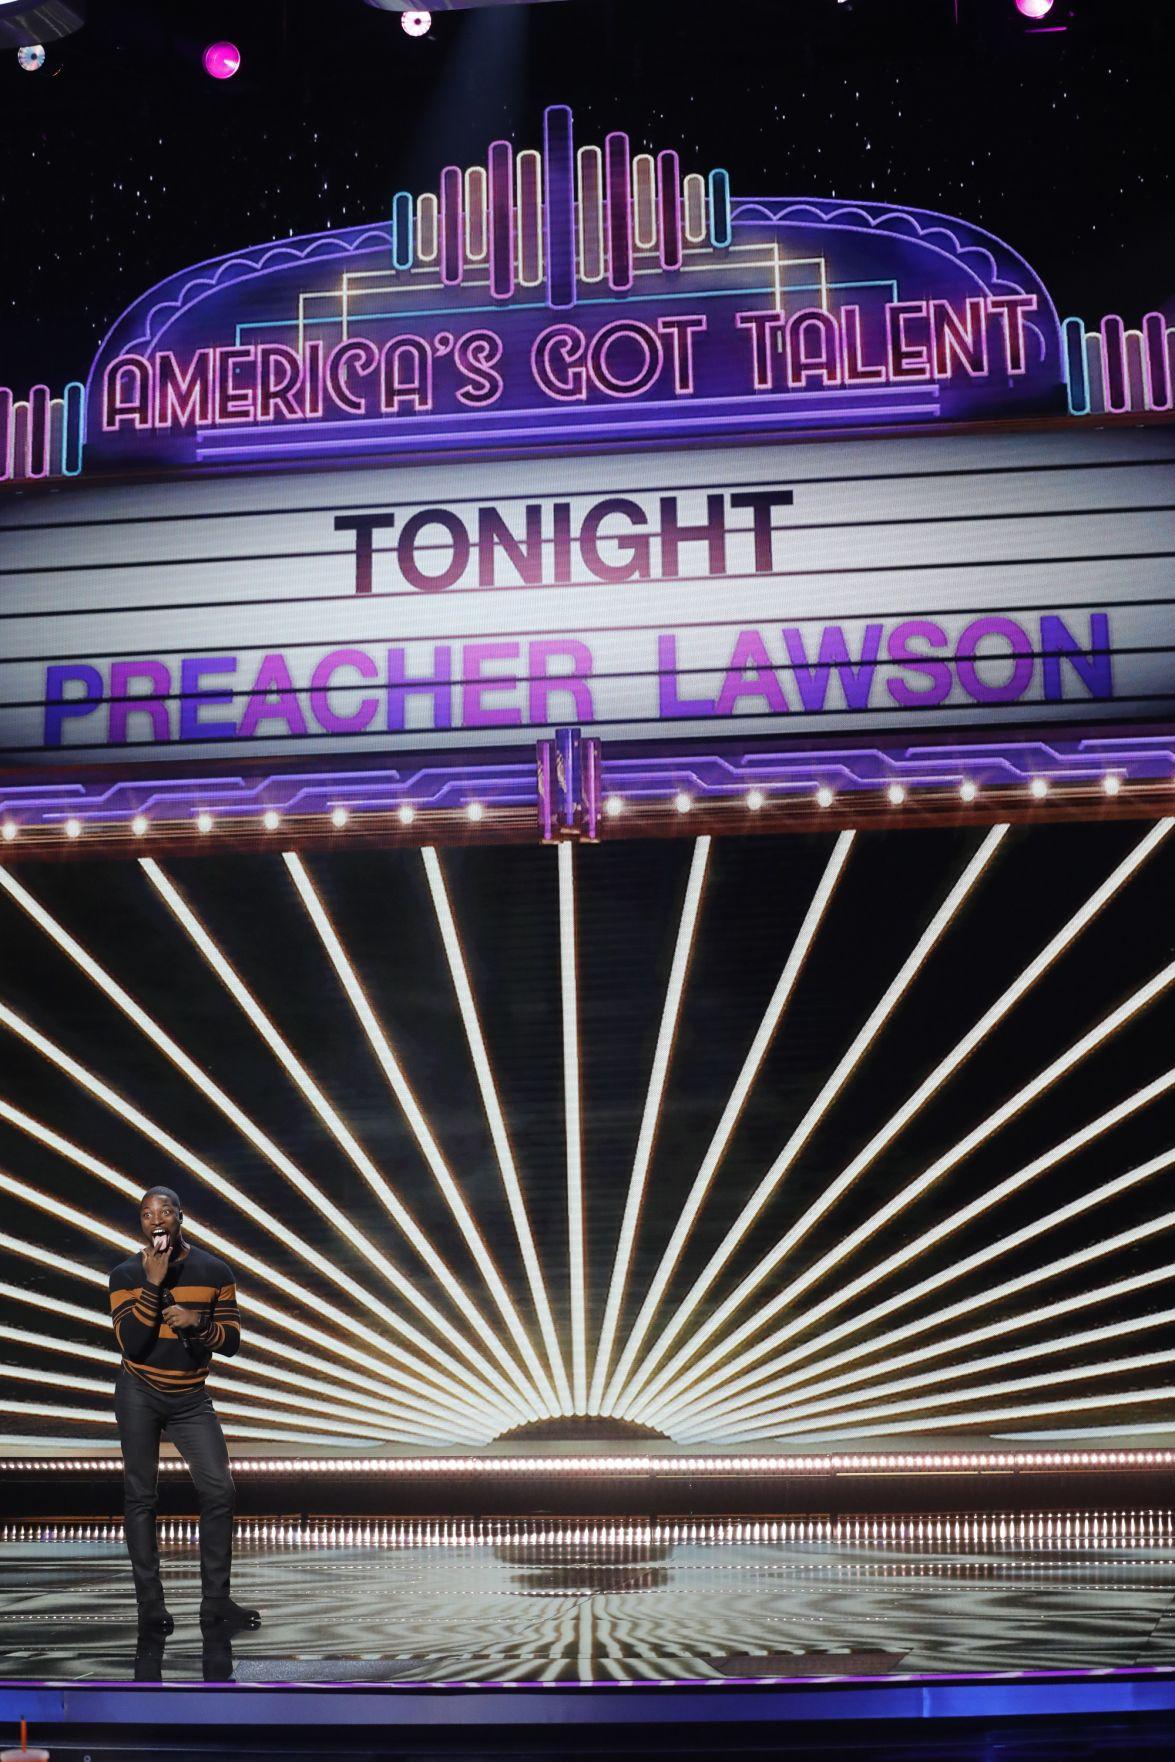 'America's Got Talent' finalist Preacher Lawson coming to ...